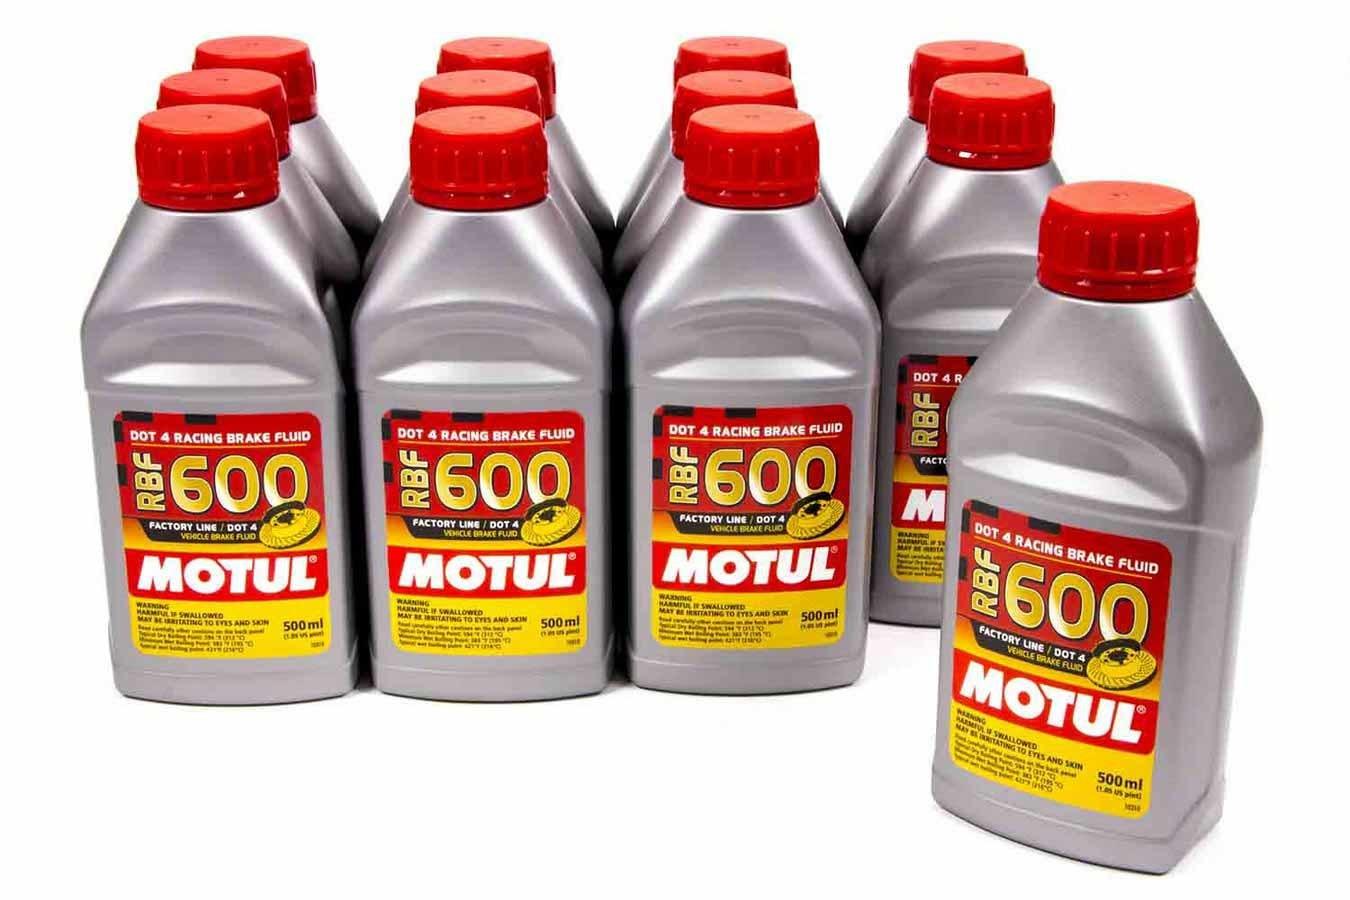 Motul 100949-12 Brake Fluid, RBF 600 Factory Line, DOT 4, Synthetic, 500 ml, Set of 12